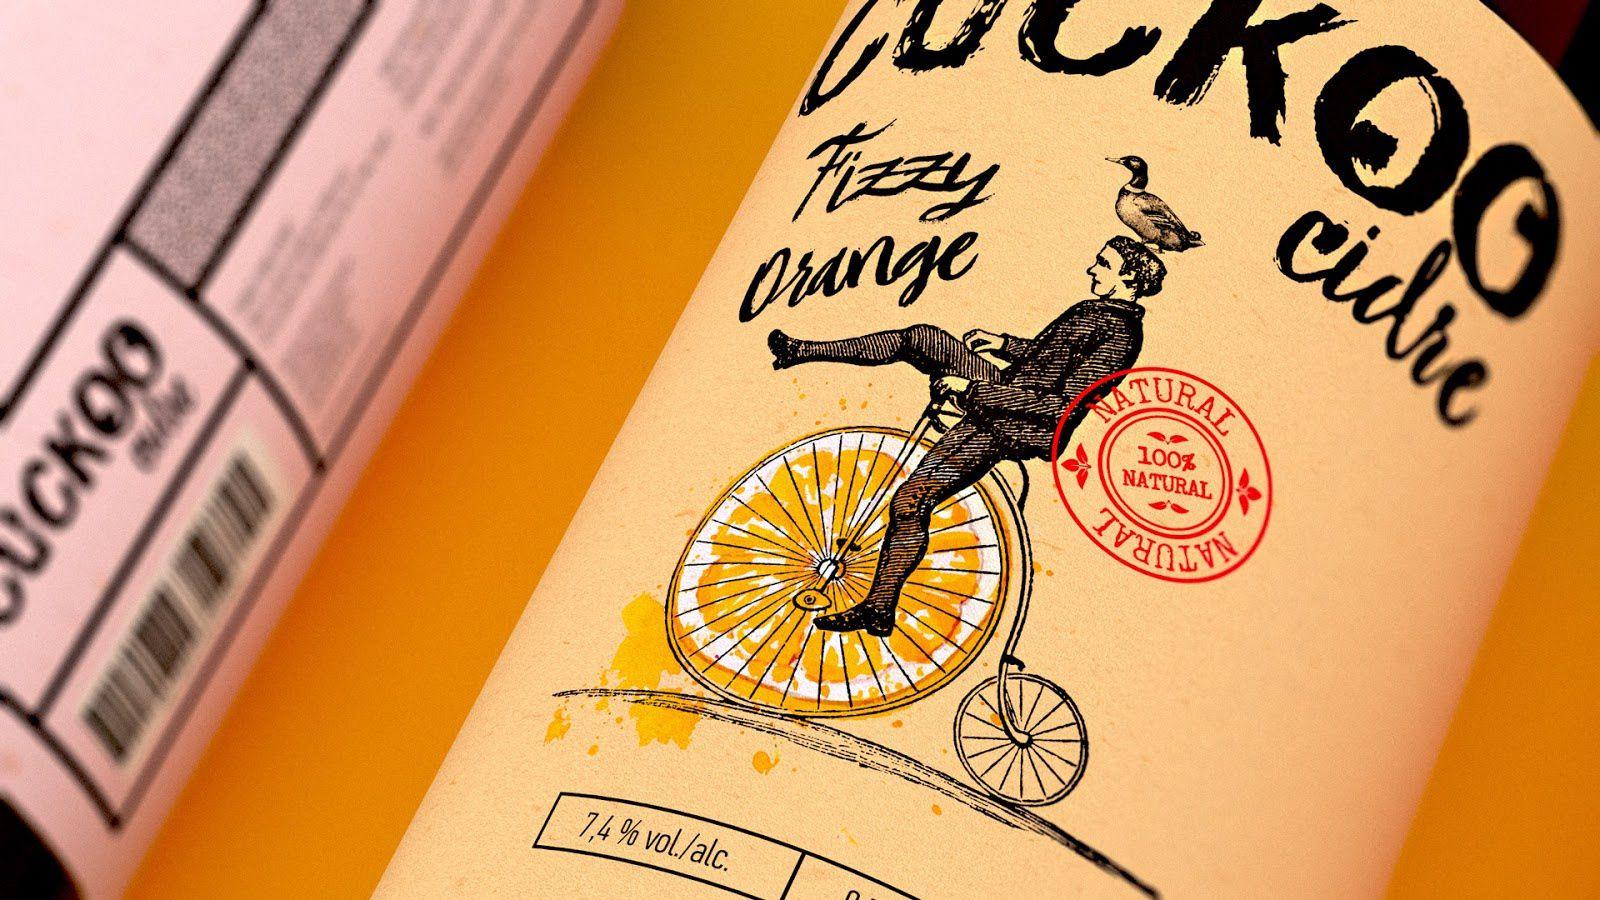 Cuckoo Cidre I Design : RYSKA Design, Ukraine (juillet 2017)